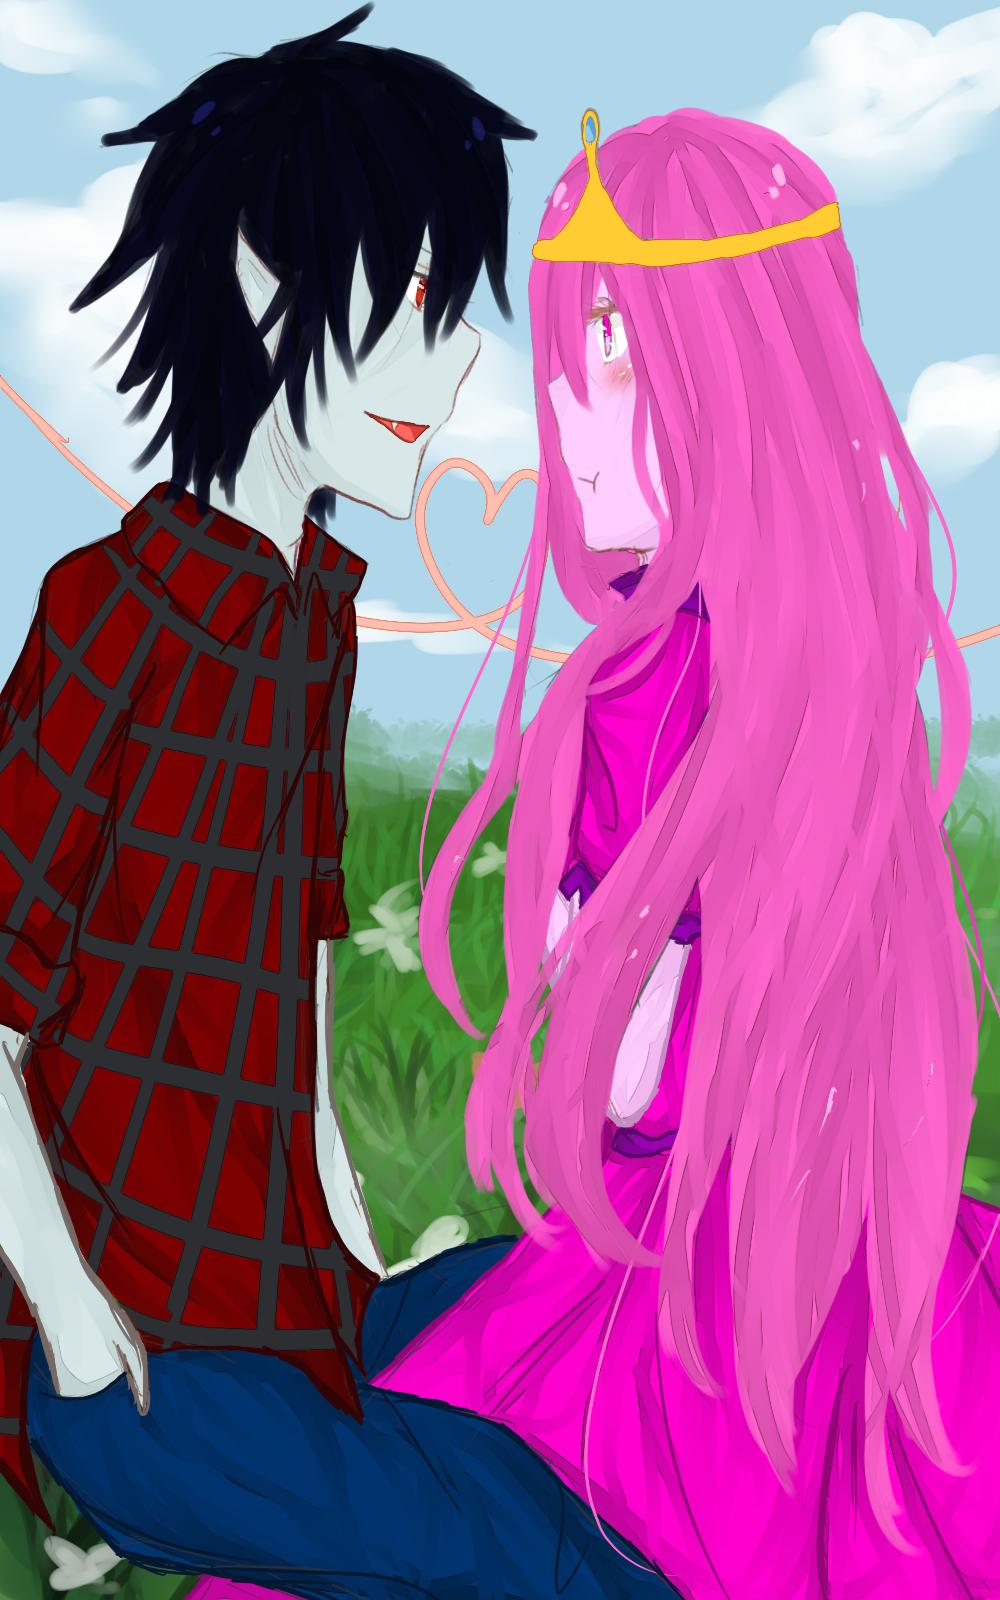 Princess Bubblegum and Marshall Lee by Claradeso on DeviantArt